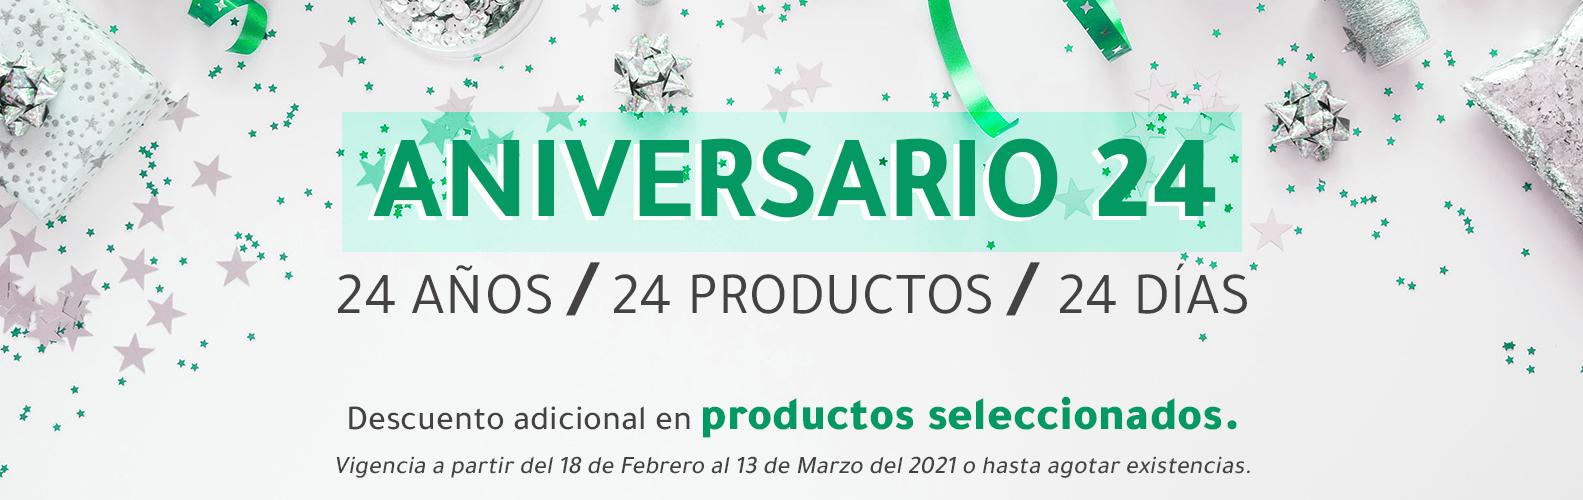 Aniversario 24